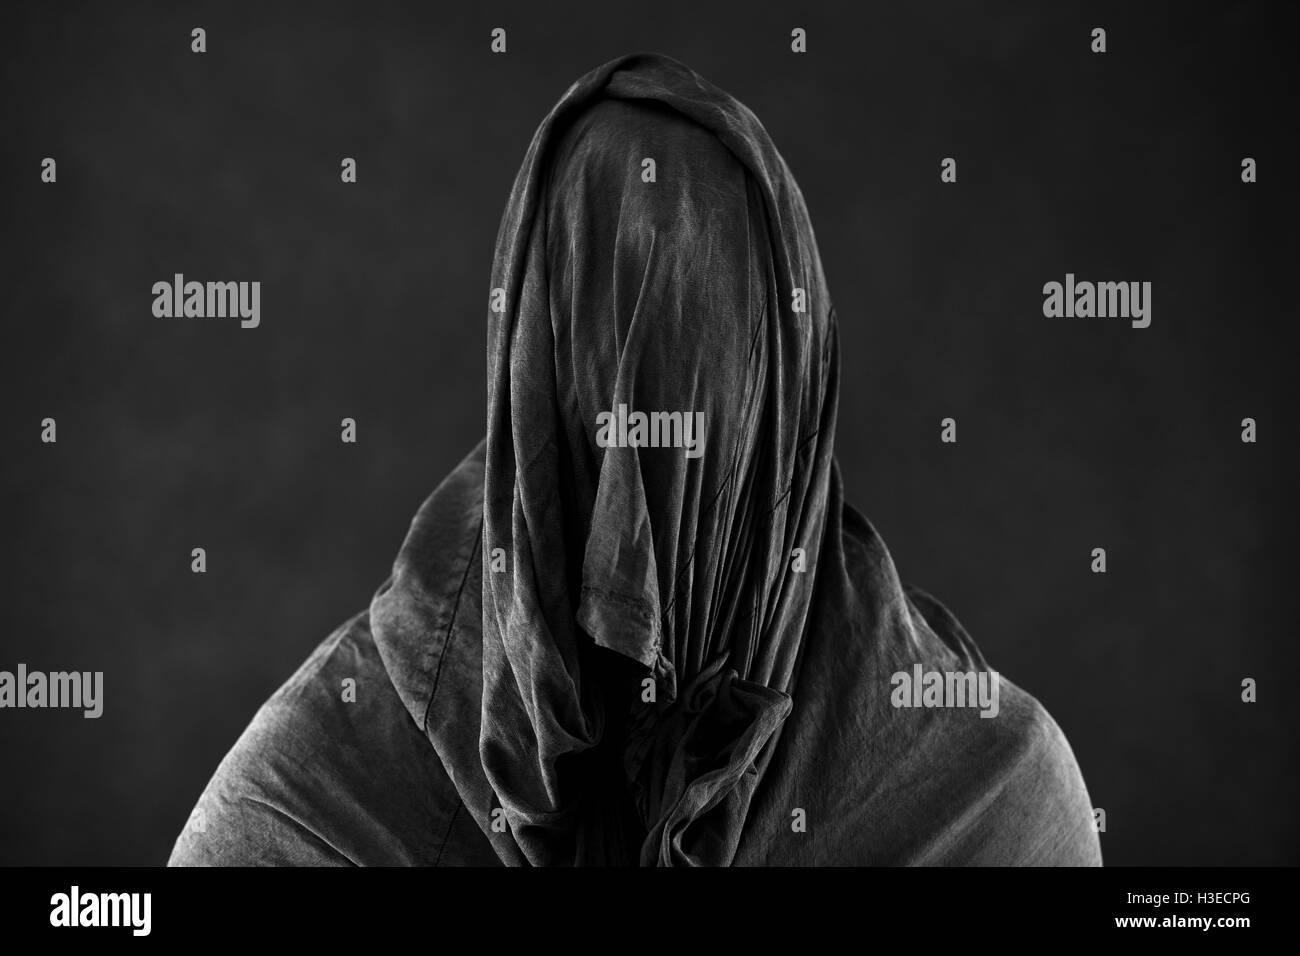 Ghost in the dark Photo Stock